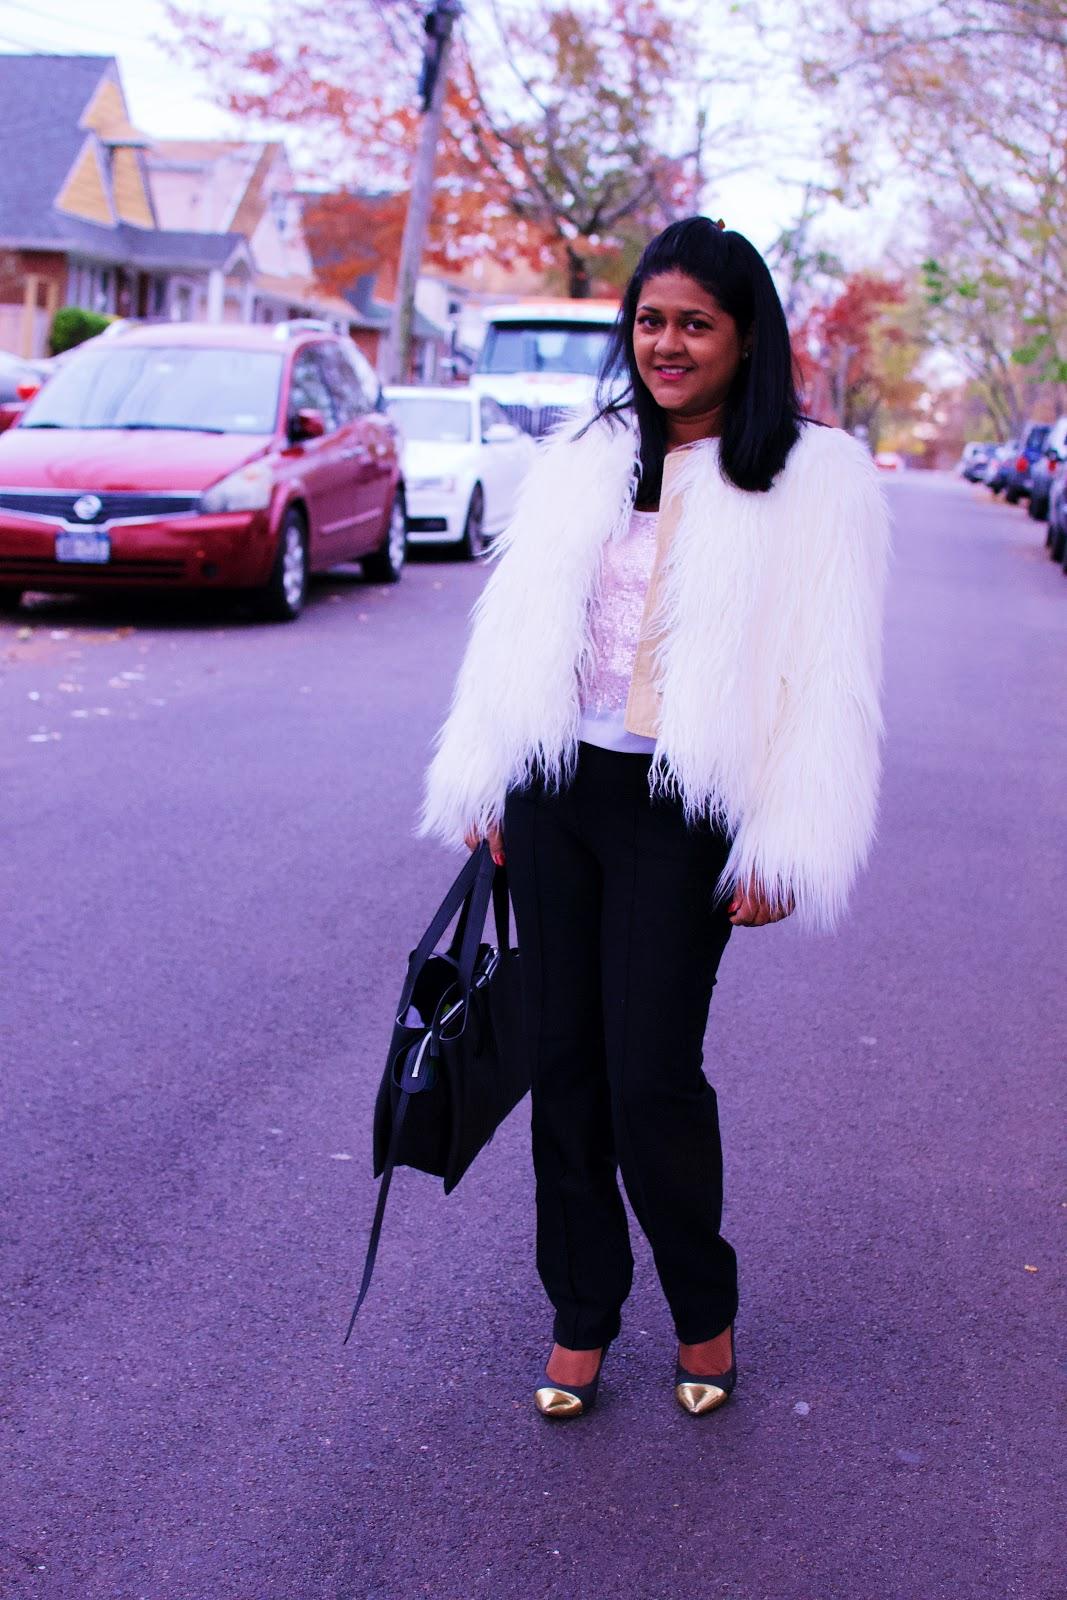 Faux fur jacket, fall jackets to wear in New York, fall fashion